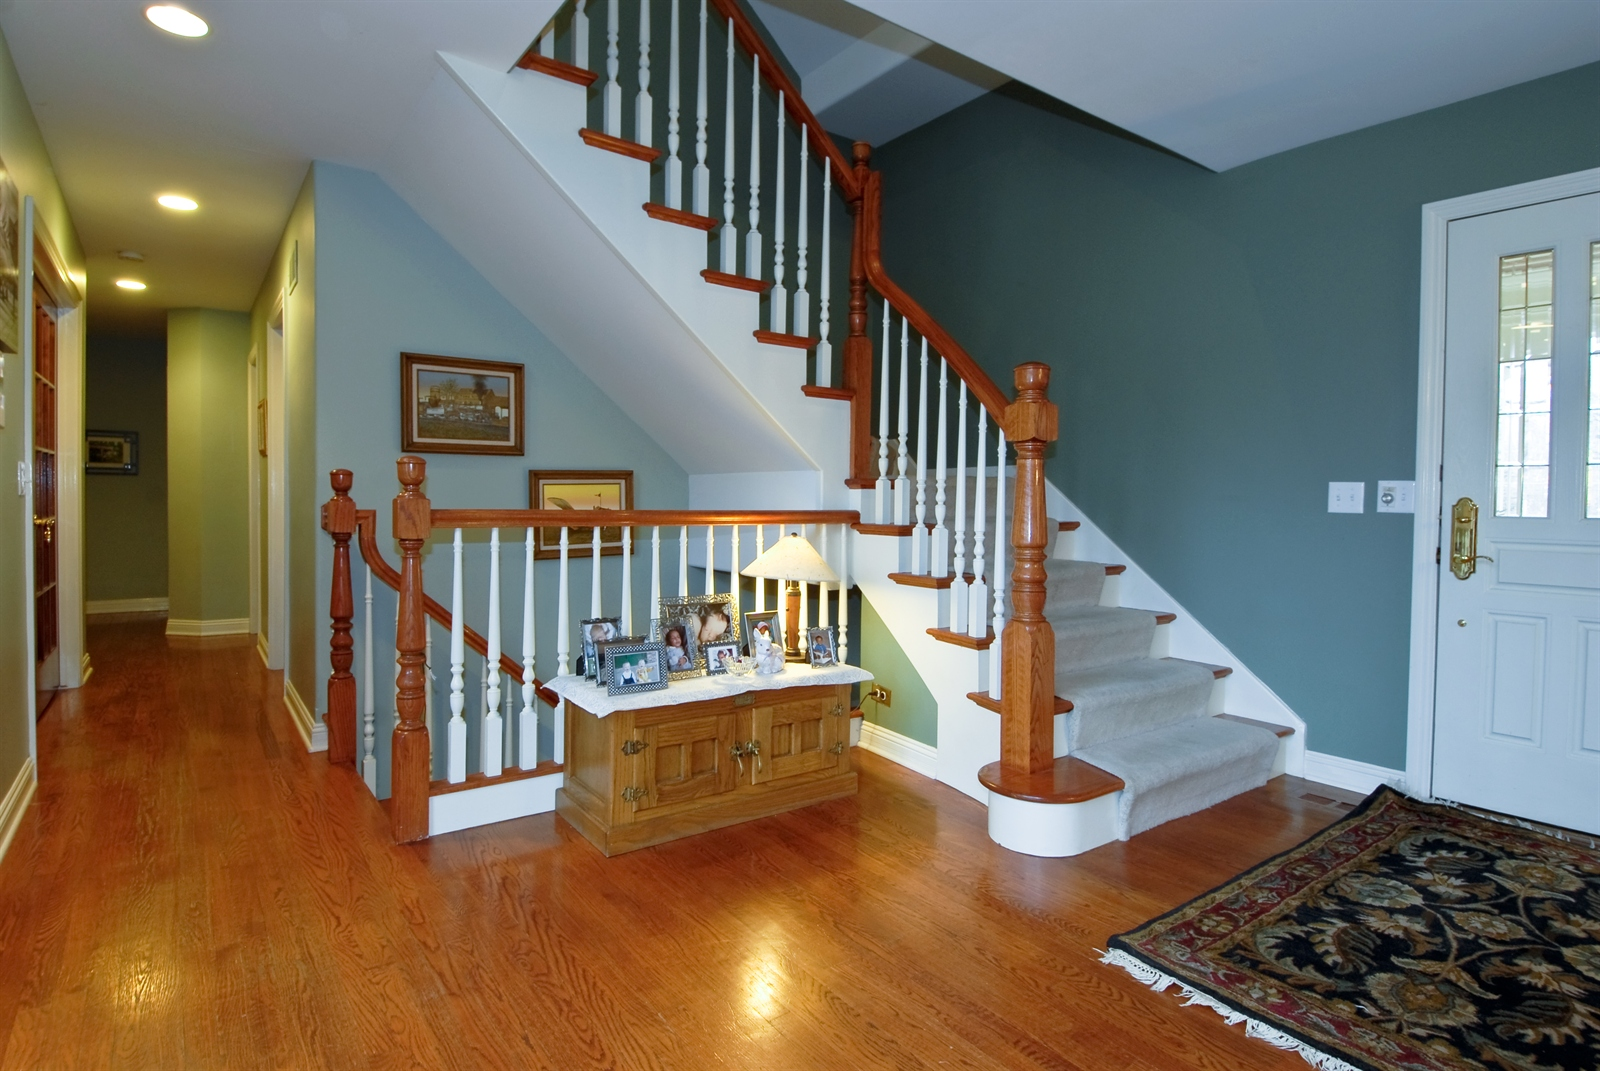 Real Estate Photography - 620 E Gartner Rd, Naperville, IL, 60540 - Foyer